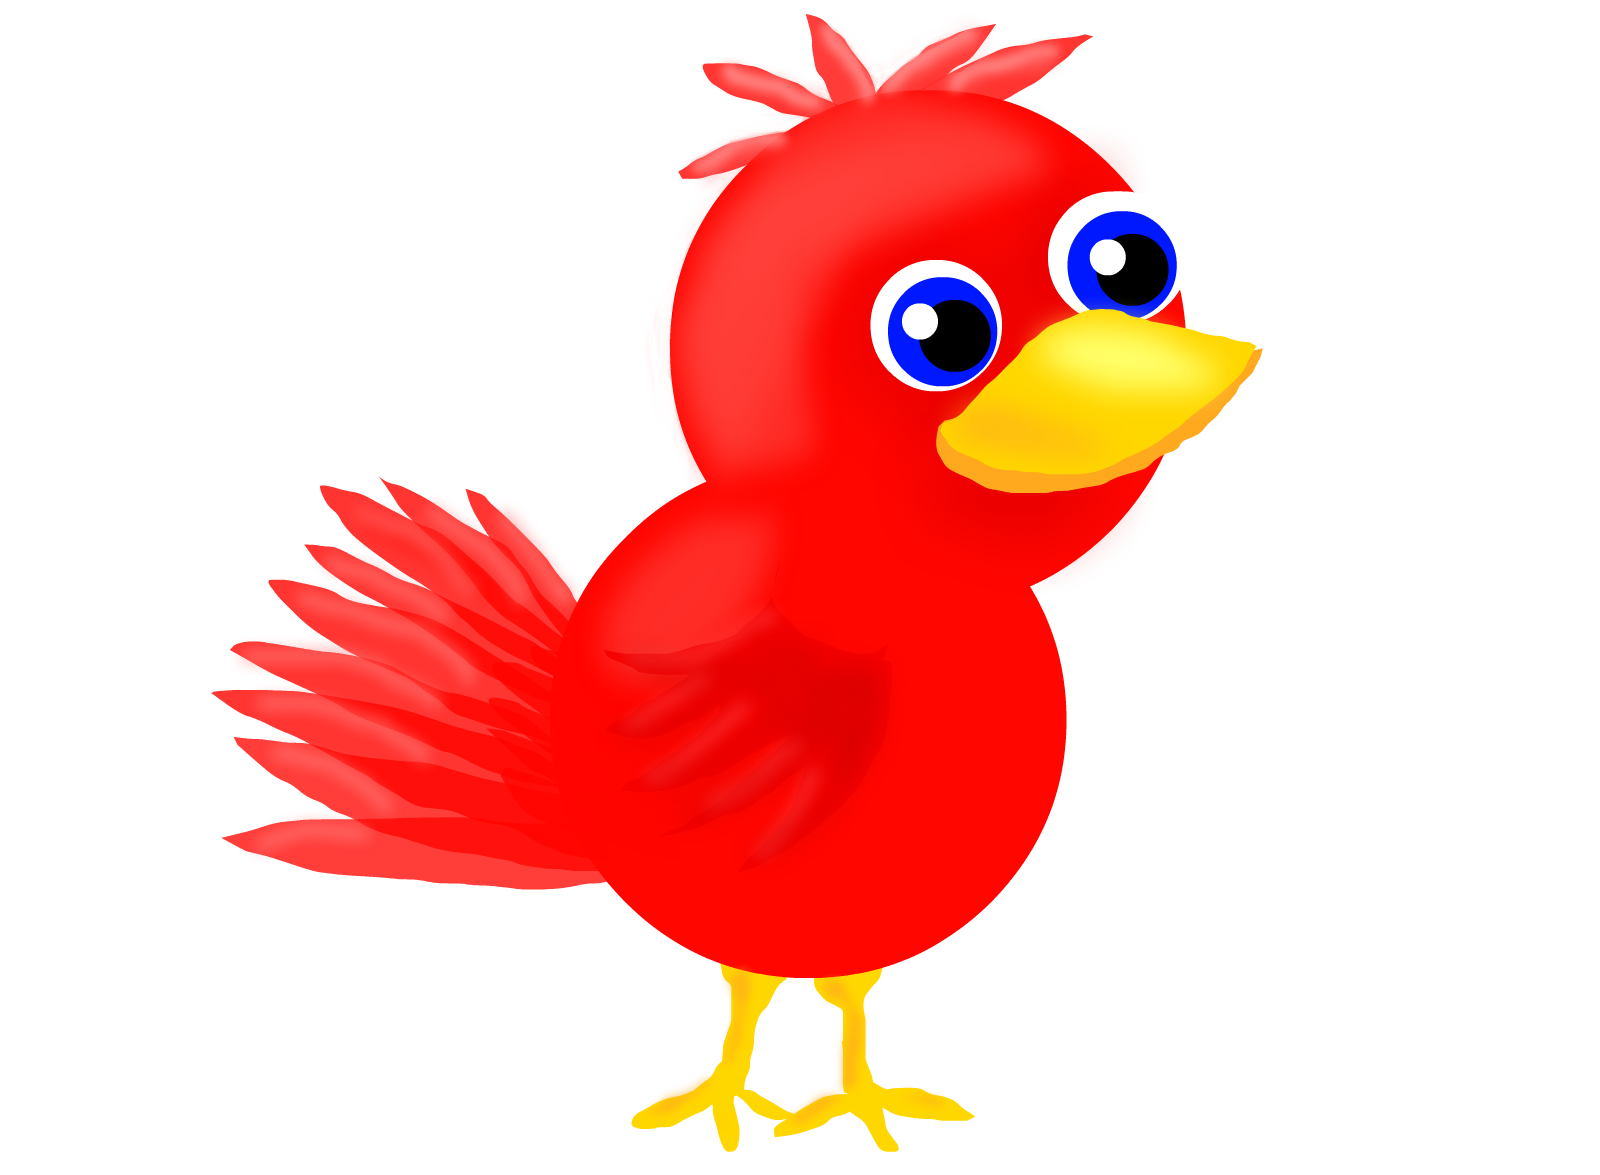 Red Bird 187 Drawings 187 Sketchport